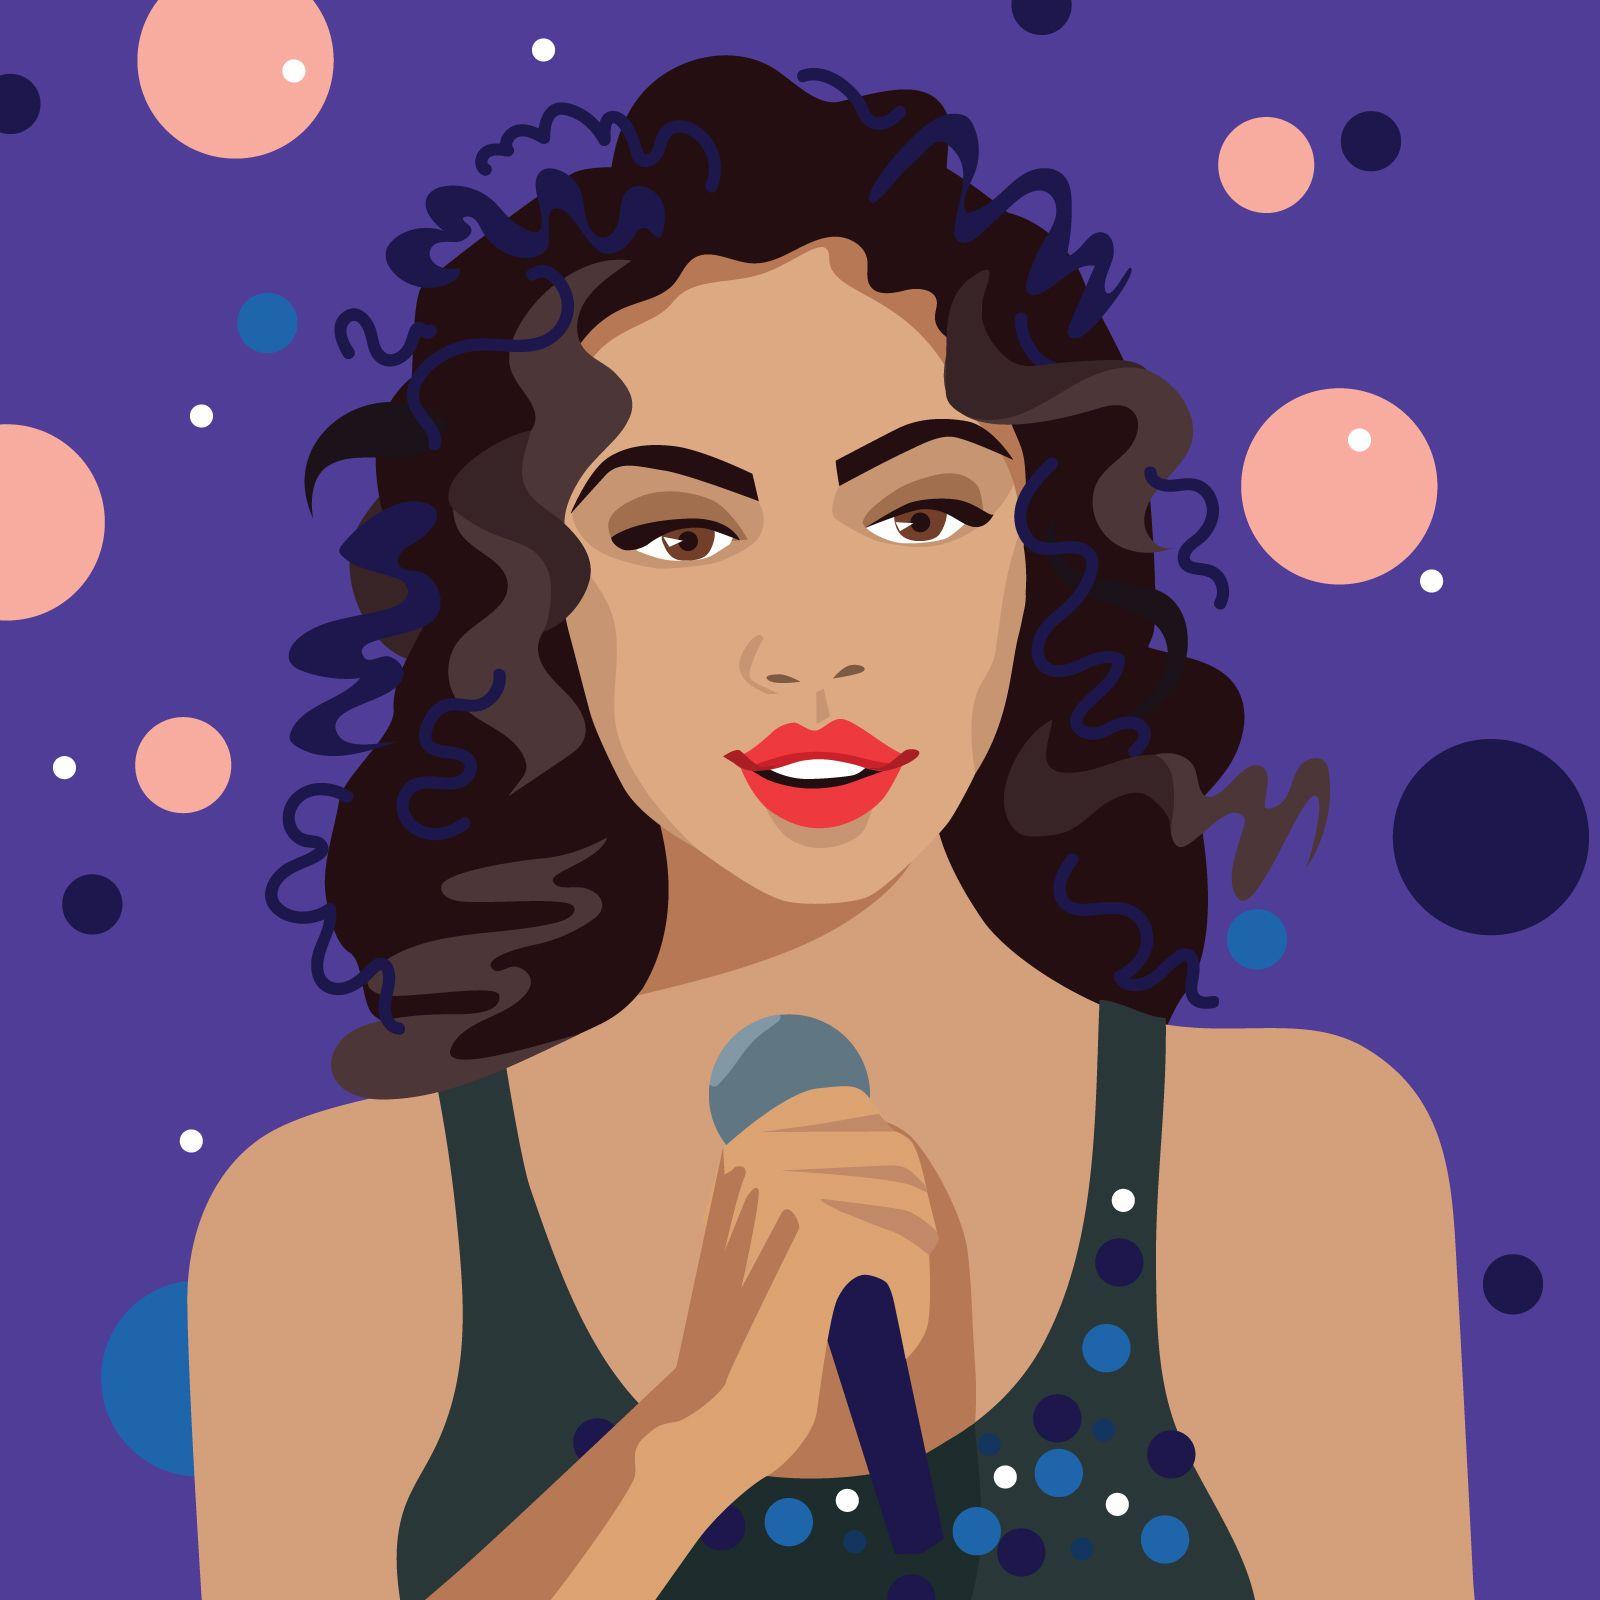 garance-illustration-Irina-Kruglova-Procter-Gambles-A-List-Twist_female